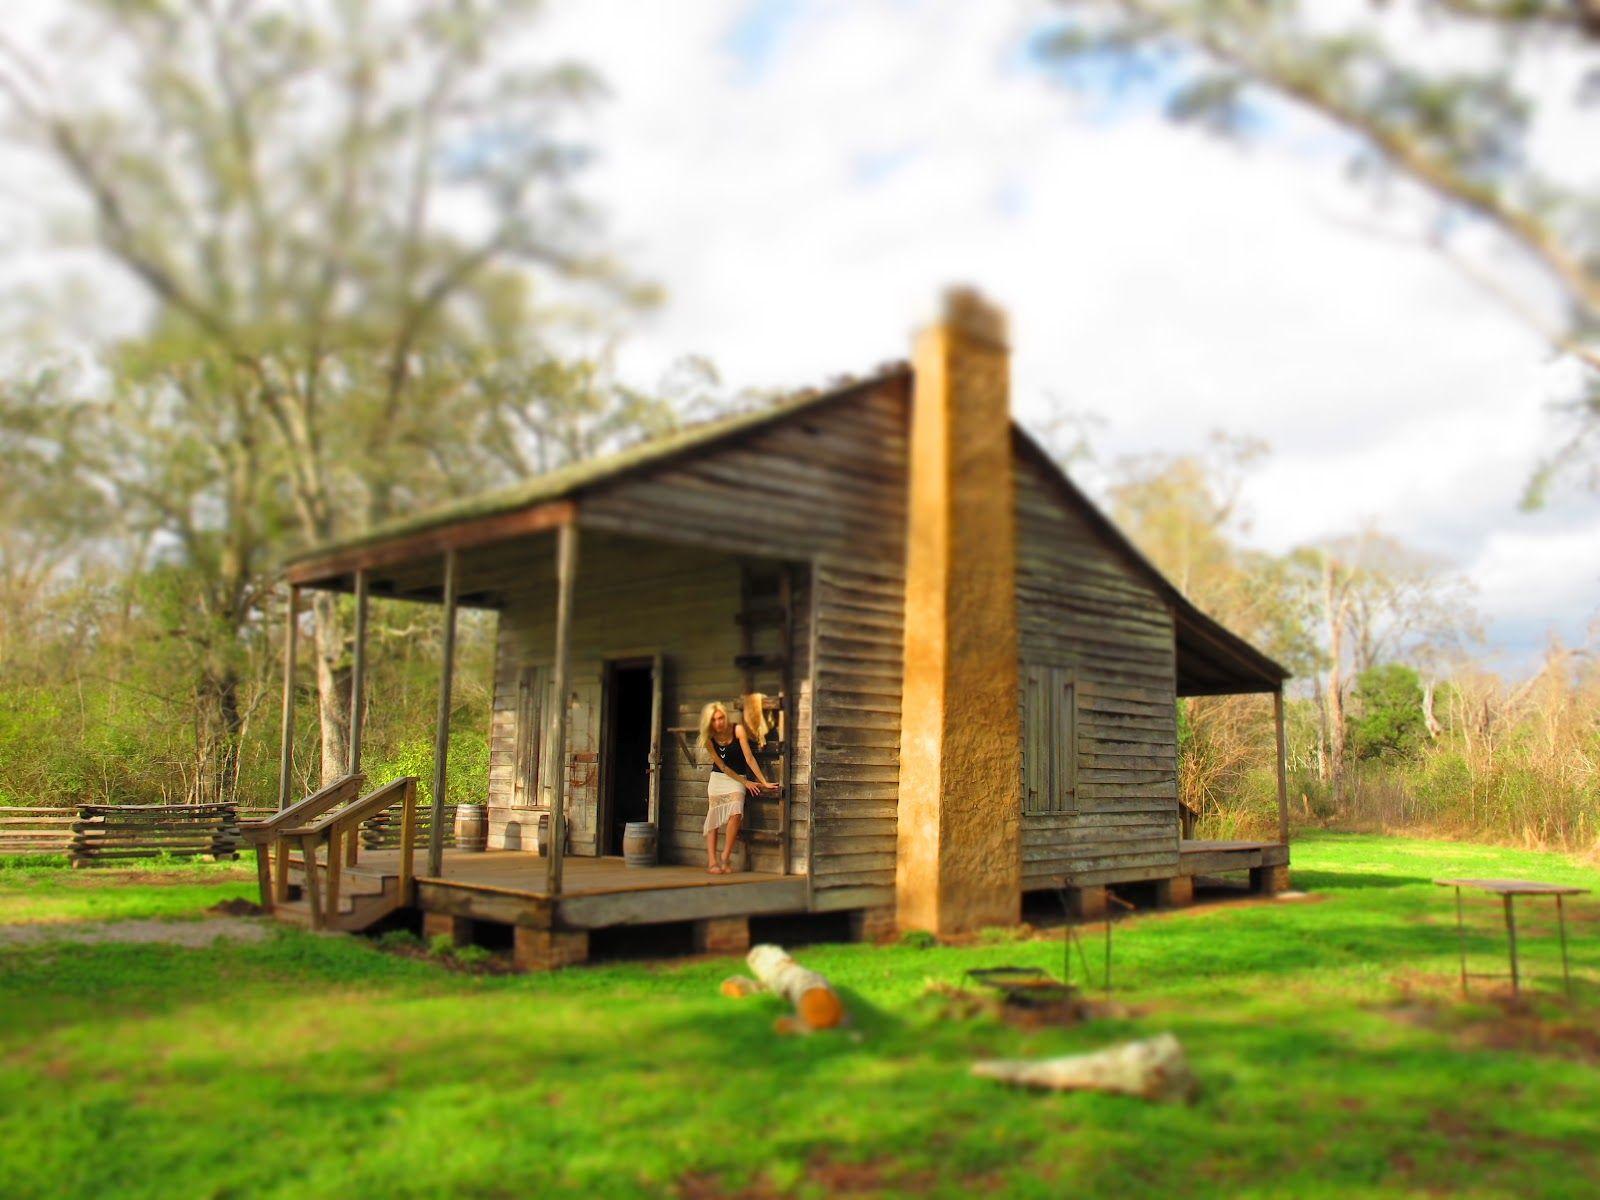 Cajun Homes Cabins And Cottages Southern Farmhouse Cajun Cottage